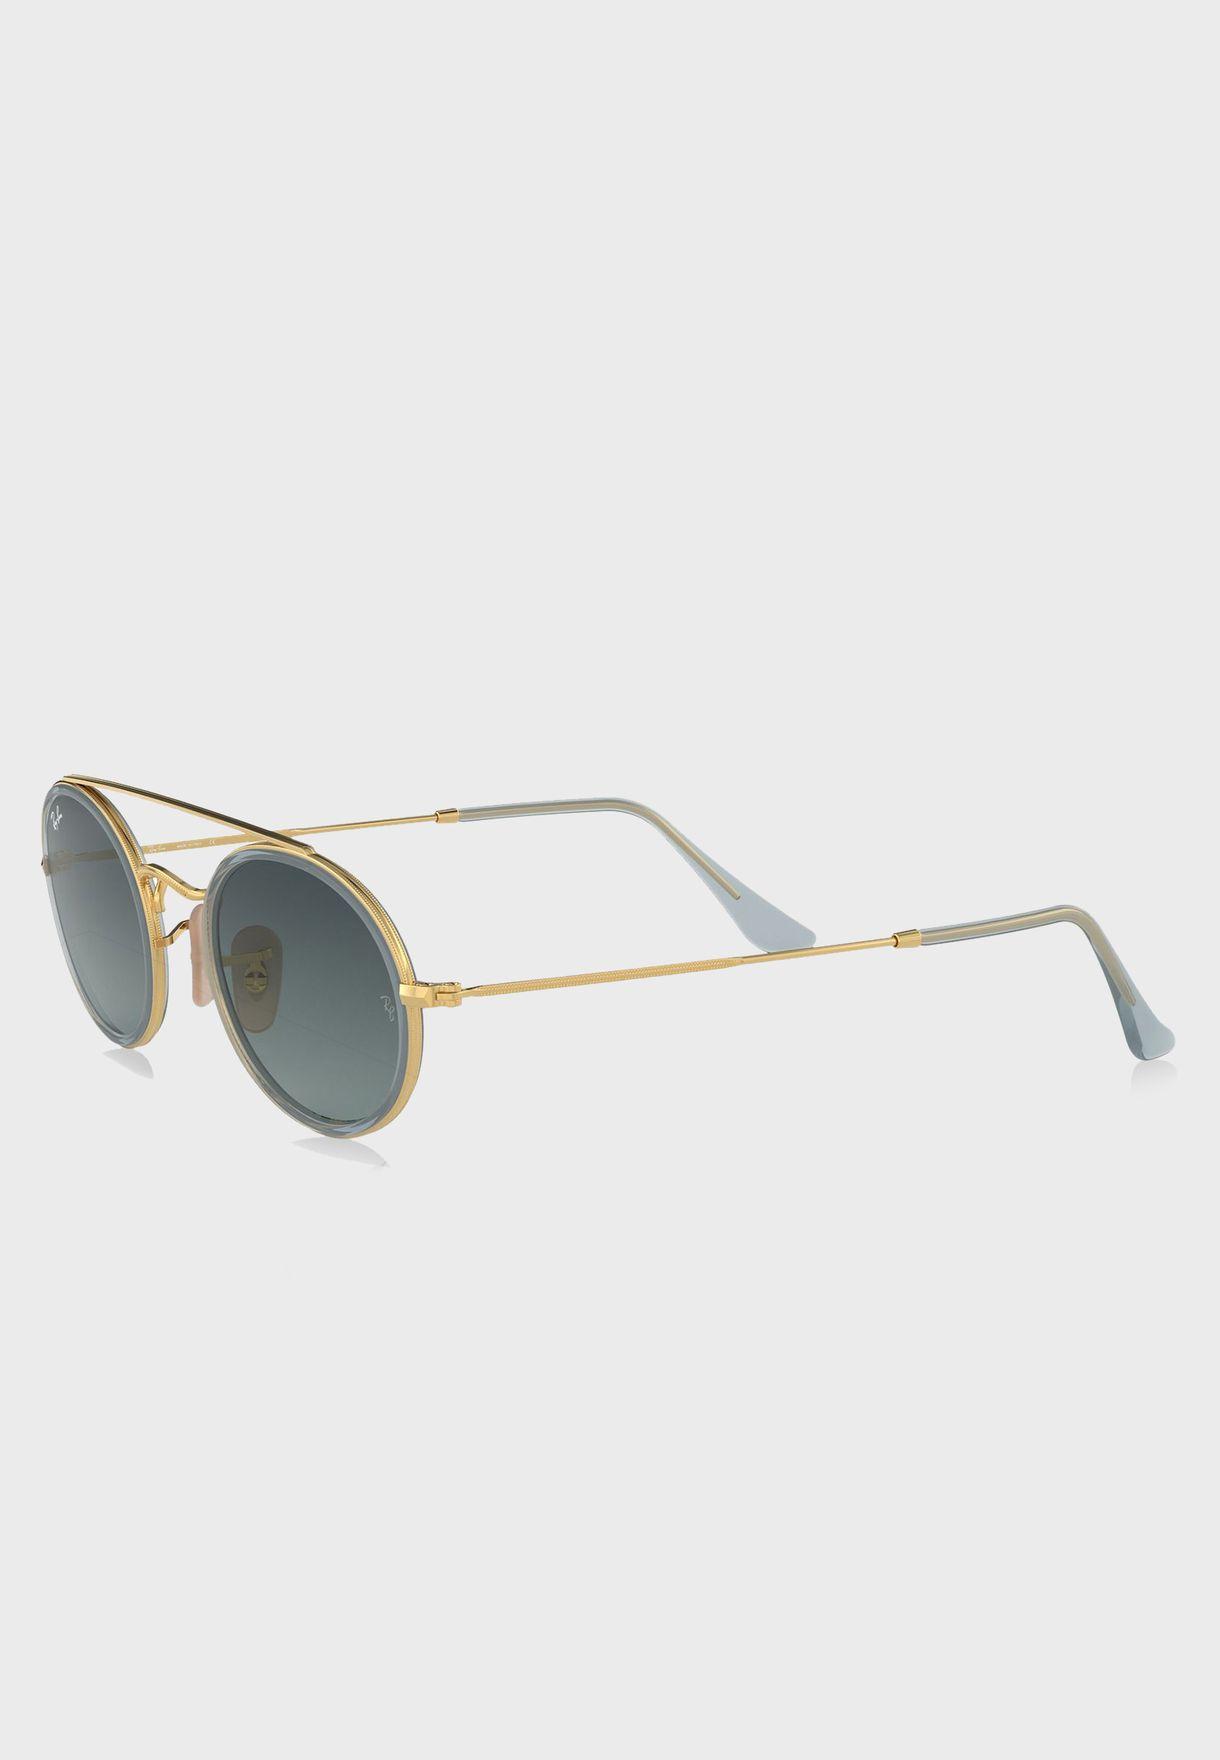 6dcb6956672 Shop Ray-Ban gold 0RB3847N Double Bridge Sunglasses 8.05367E+12 for ...